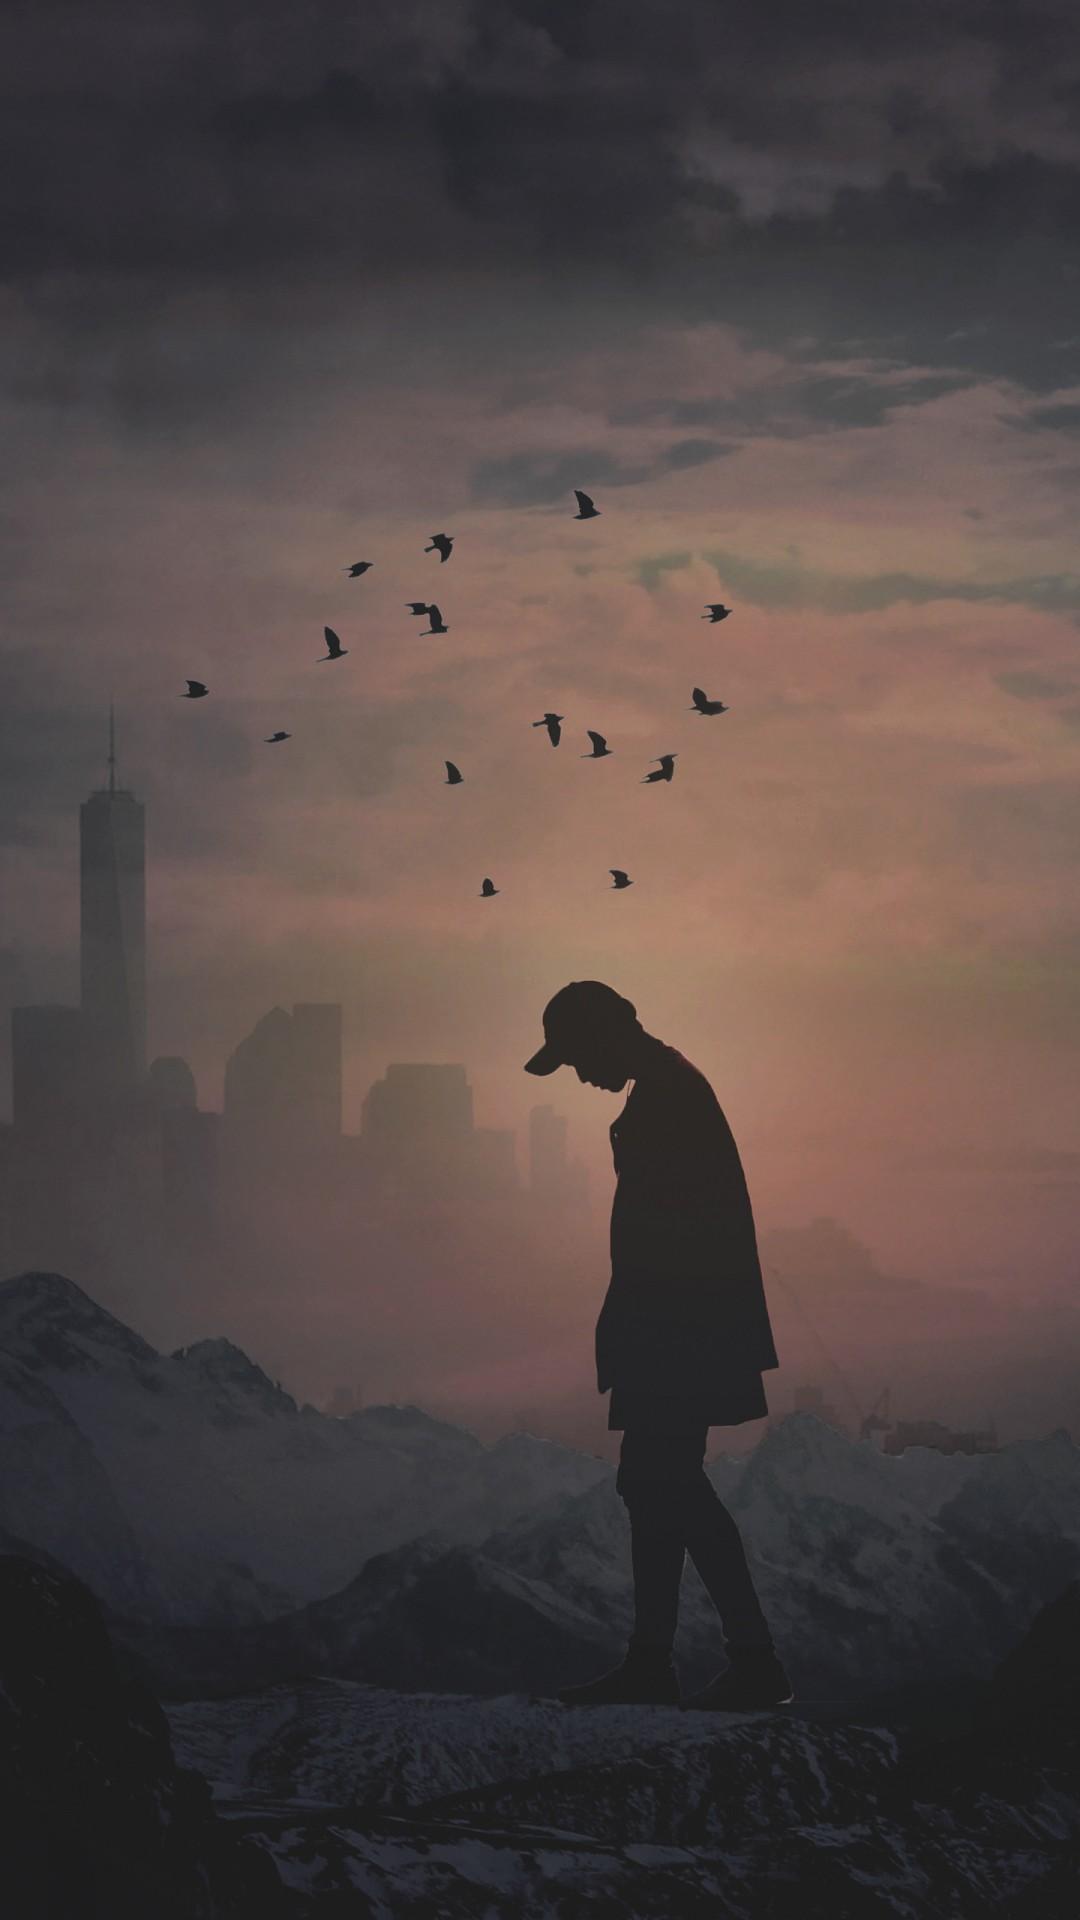 Lonely Boy Wallpaper Hd Alone Silhouette 4k Wallpapers Hd Wallpapers Id 24418